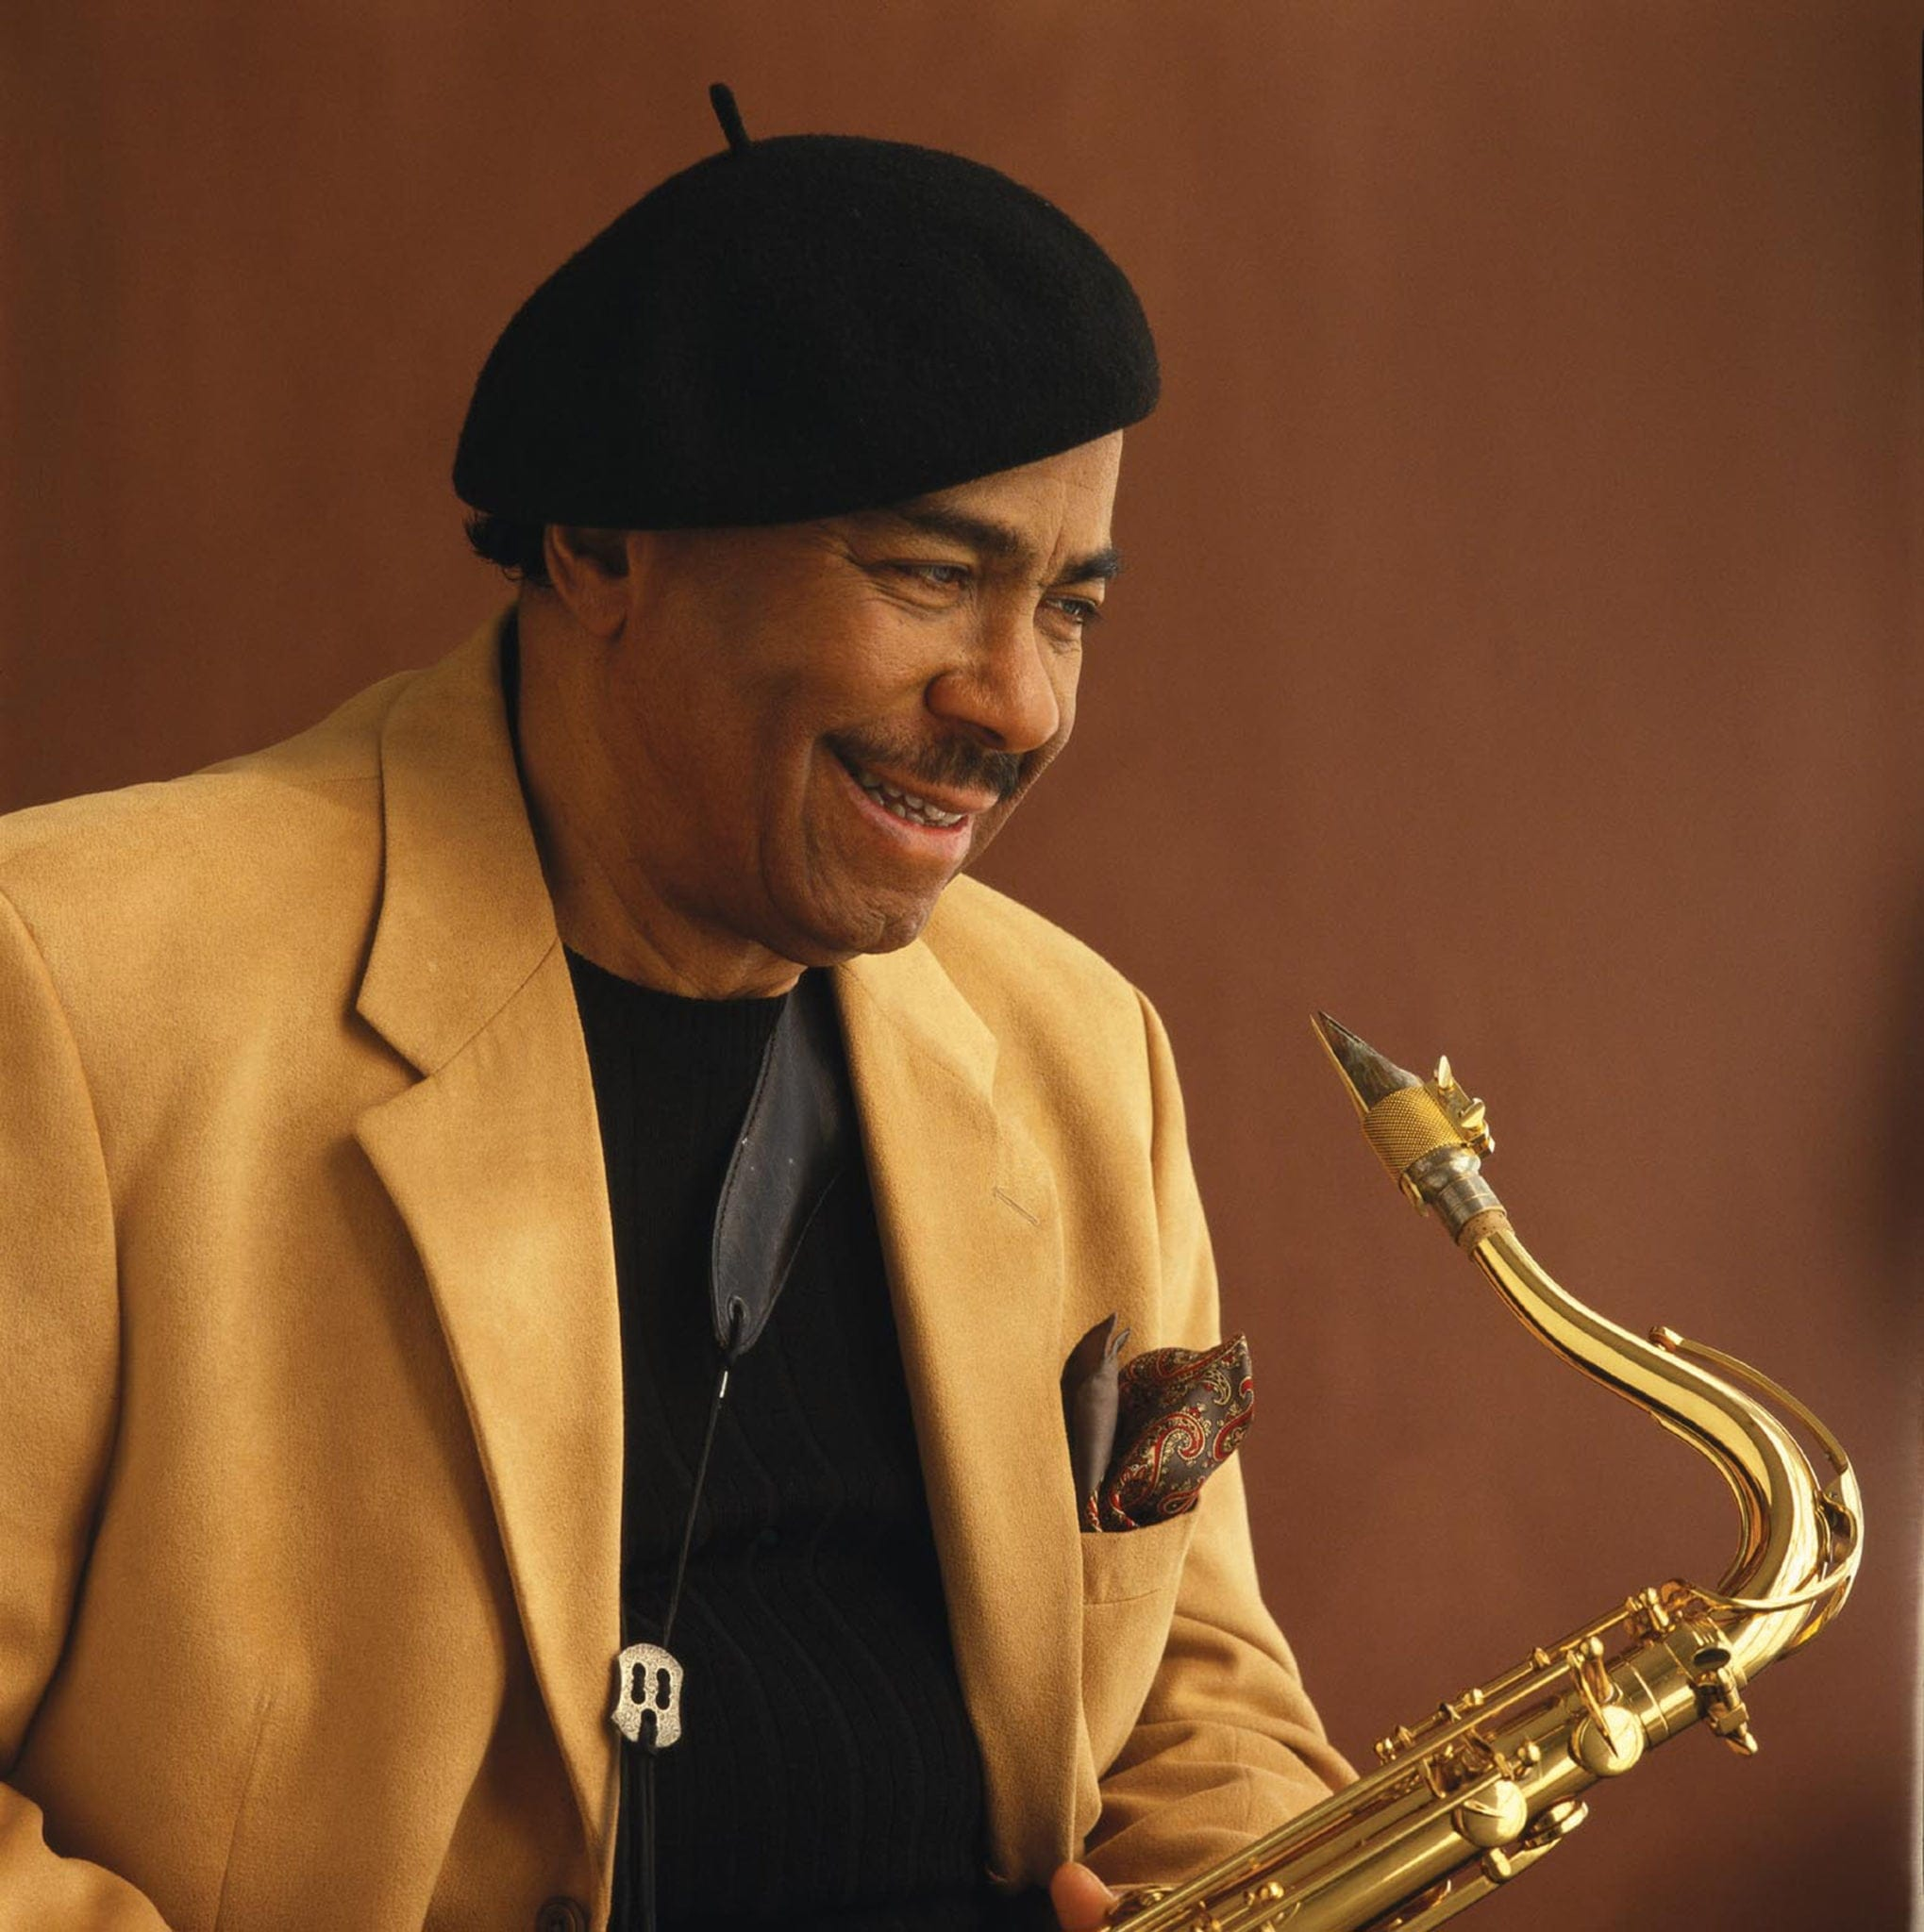 Jazz saxophonist Benny Golson. (Photo by Lisas Stein)